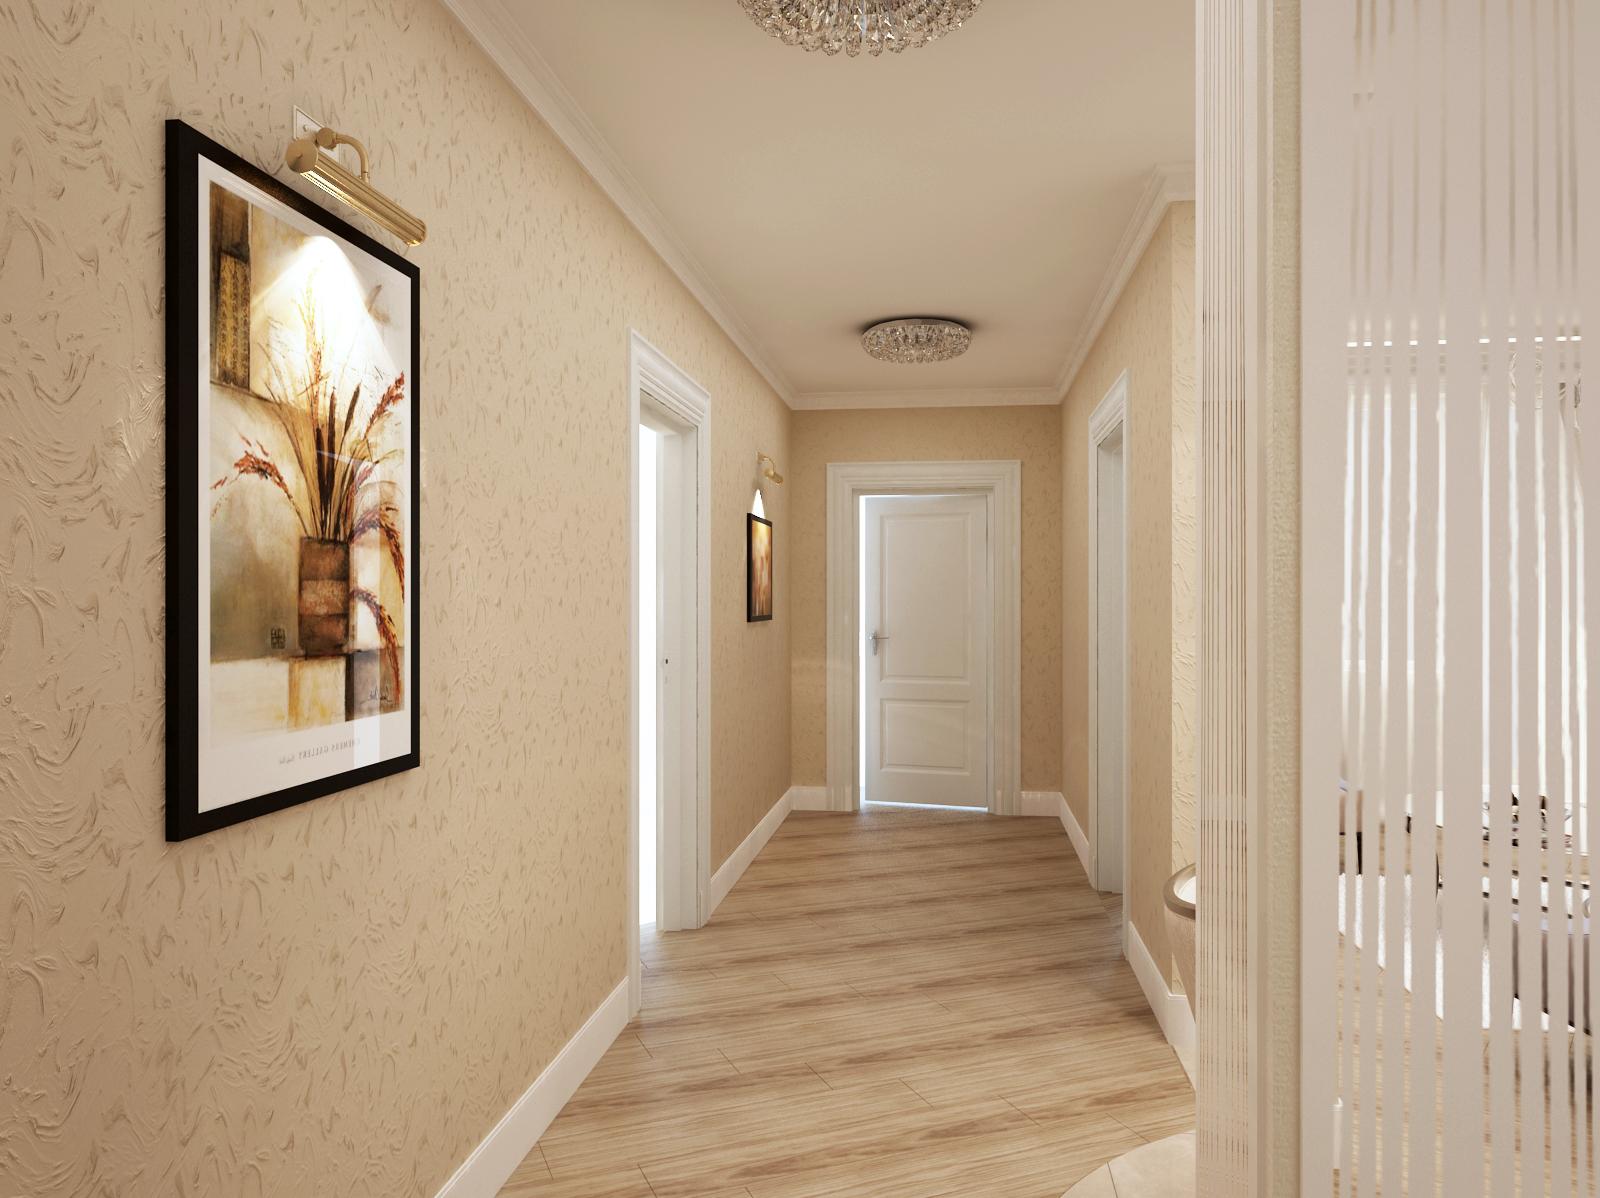 бежевые обои в коридоре